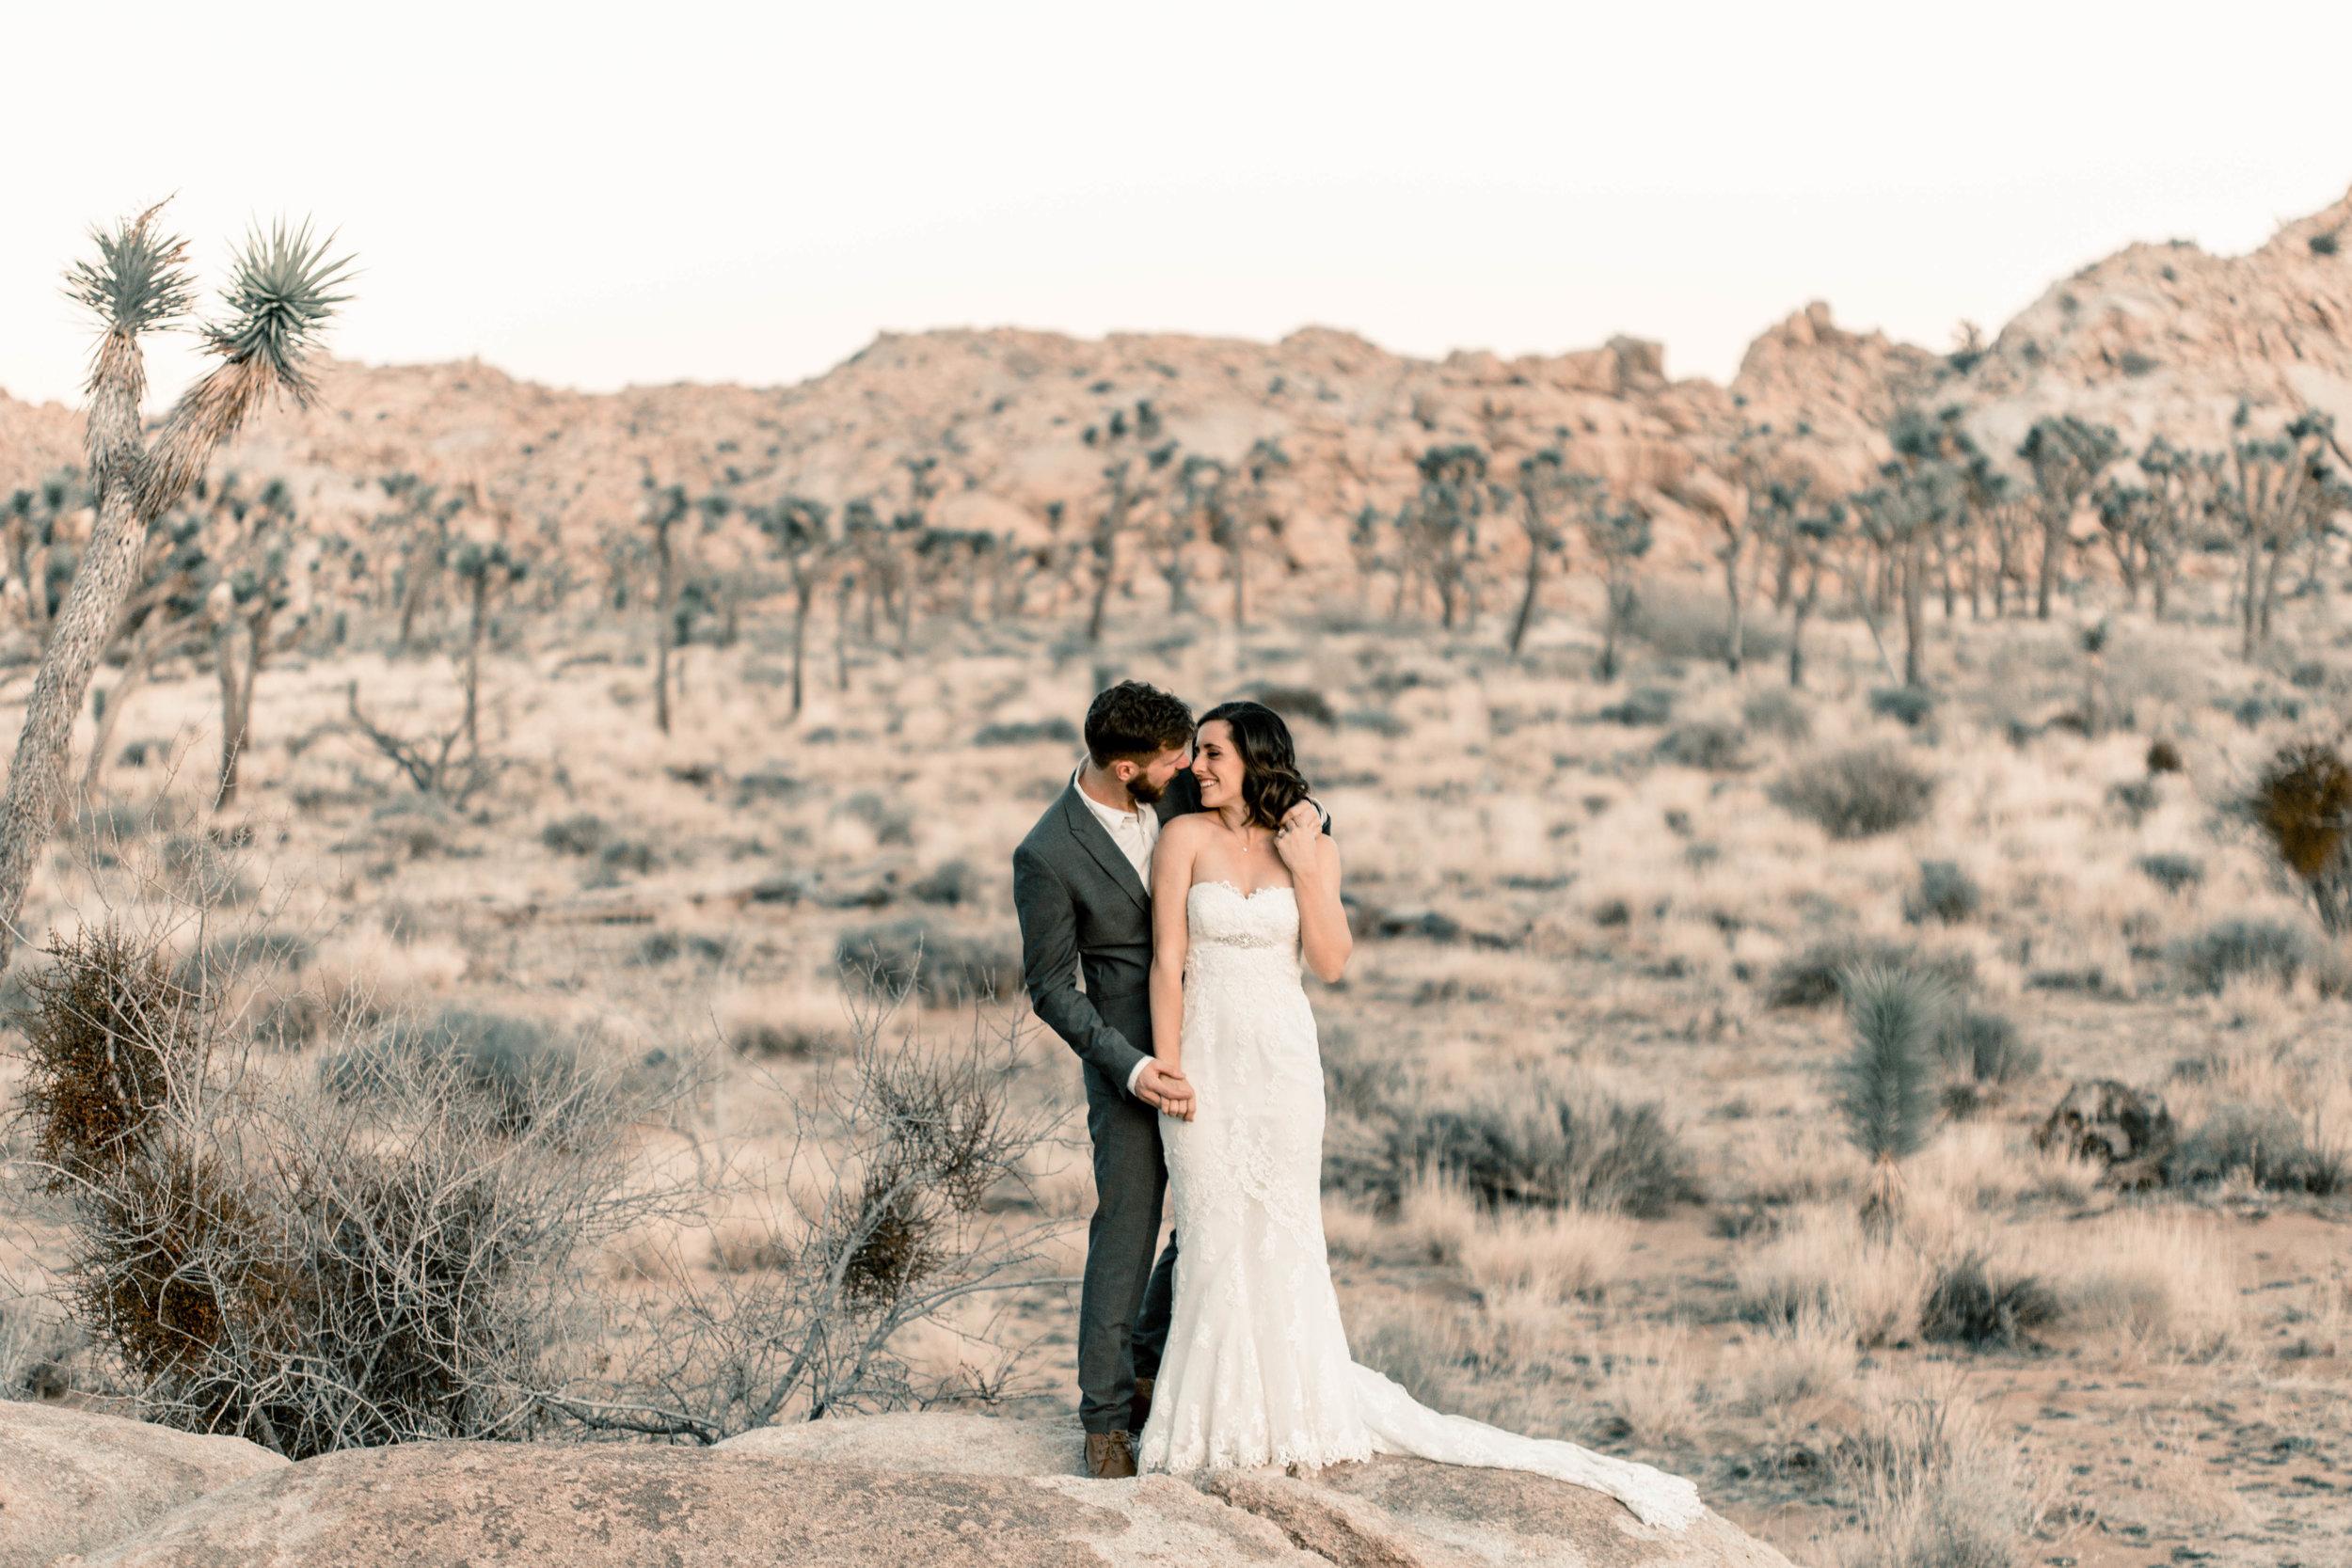 nicole-daacke-photography-joshua-tree-adventurous-elopement-wedding-national-park-wedding-photographer-adventure-wedding-adventurous-elopement-jtree-joshua-tree-national-park-wedding-photographer-intimate-weddings-golden-desert-love-37.jpg